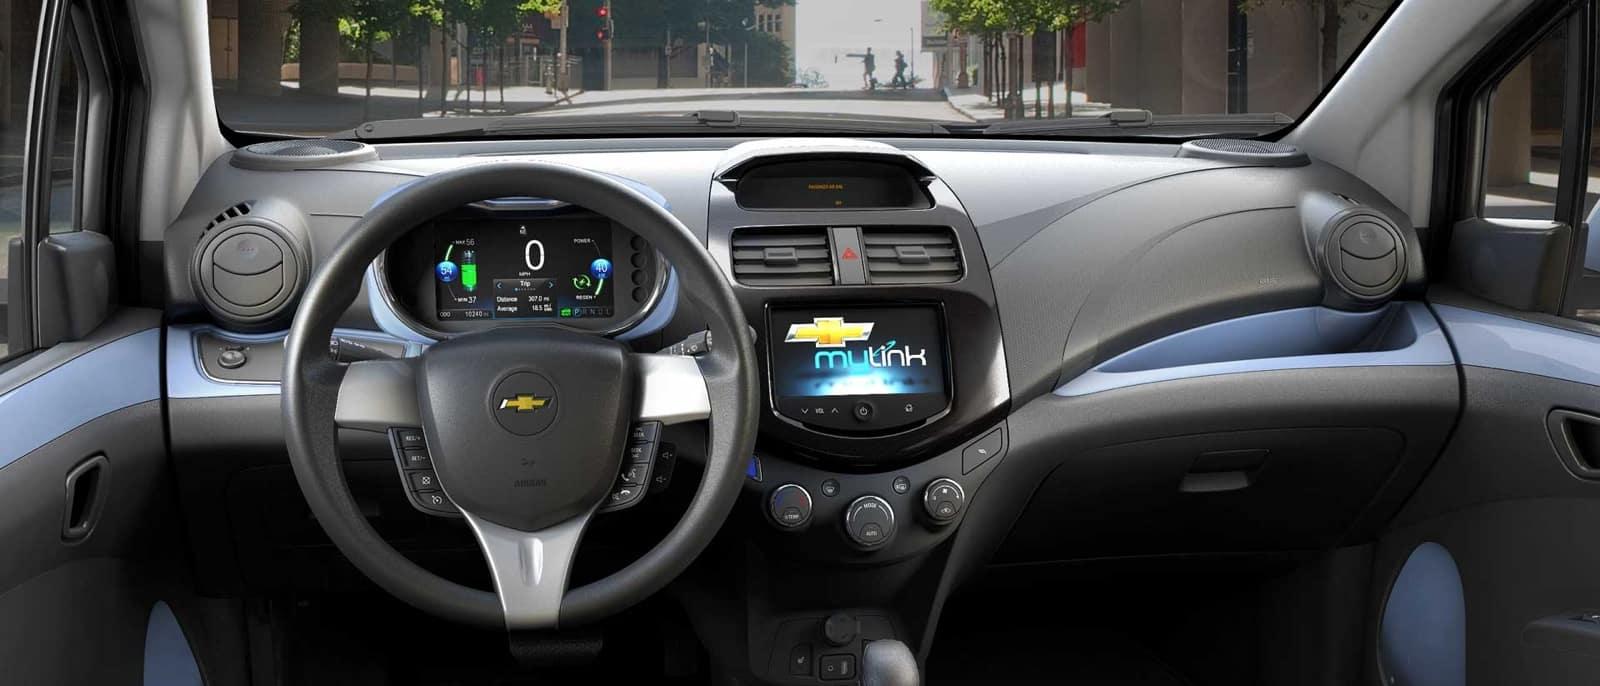 Captivating 2014 Chevrolet Spark EV ...